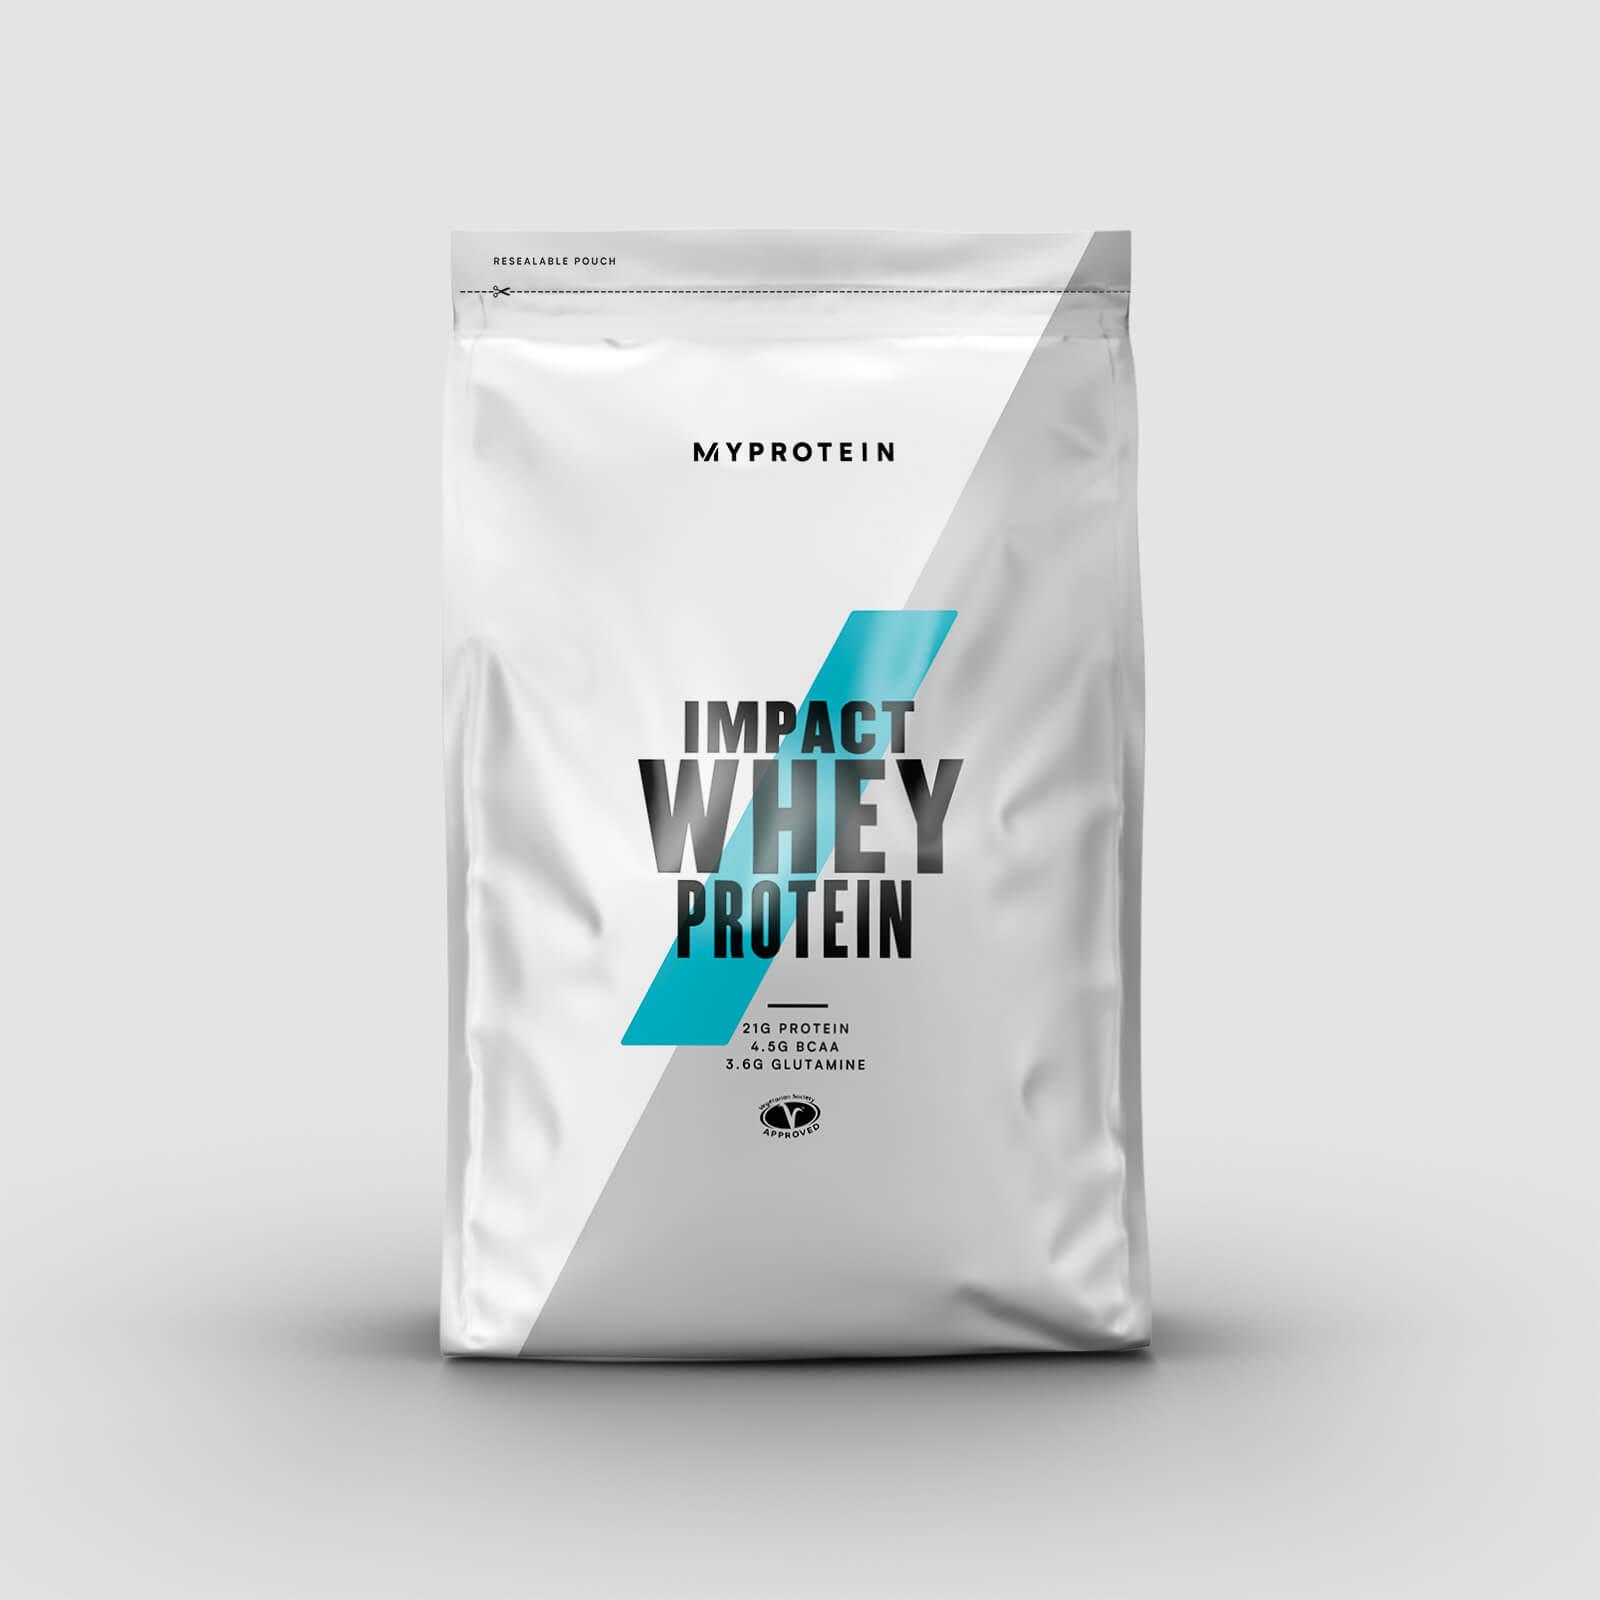 Myprotein Impact Whey Protein - 250g - Noix De Coco